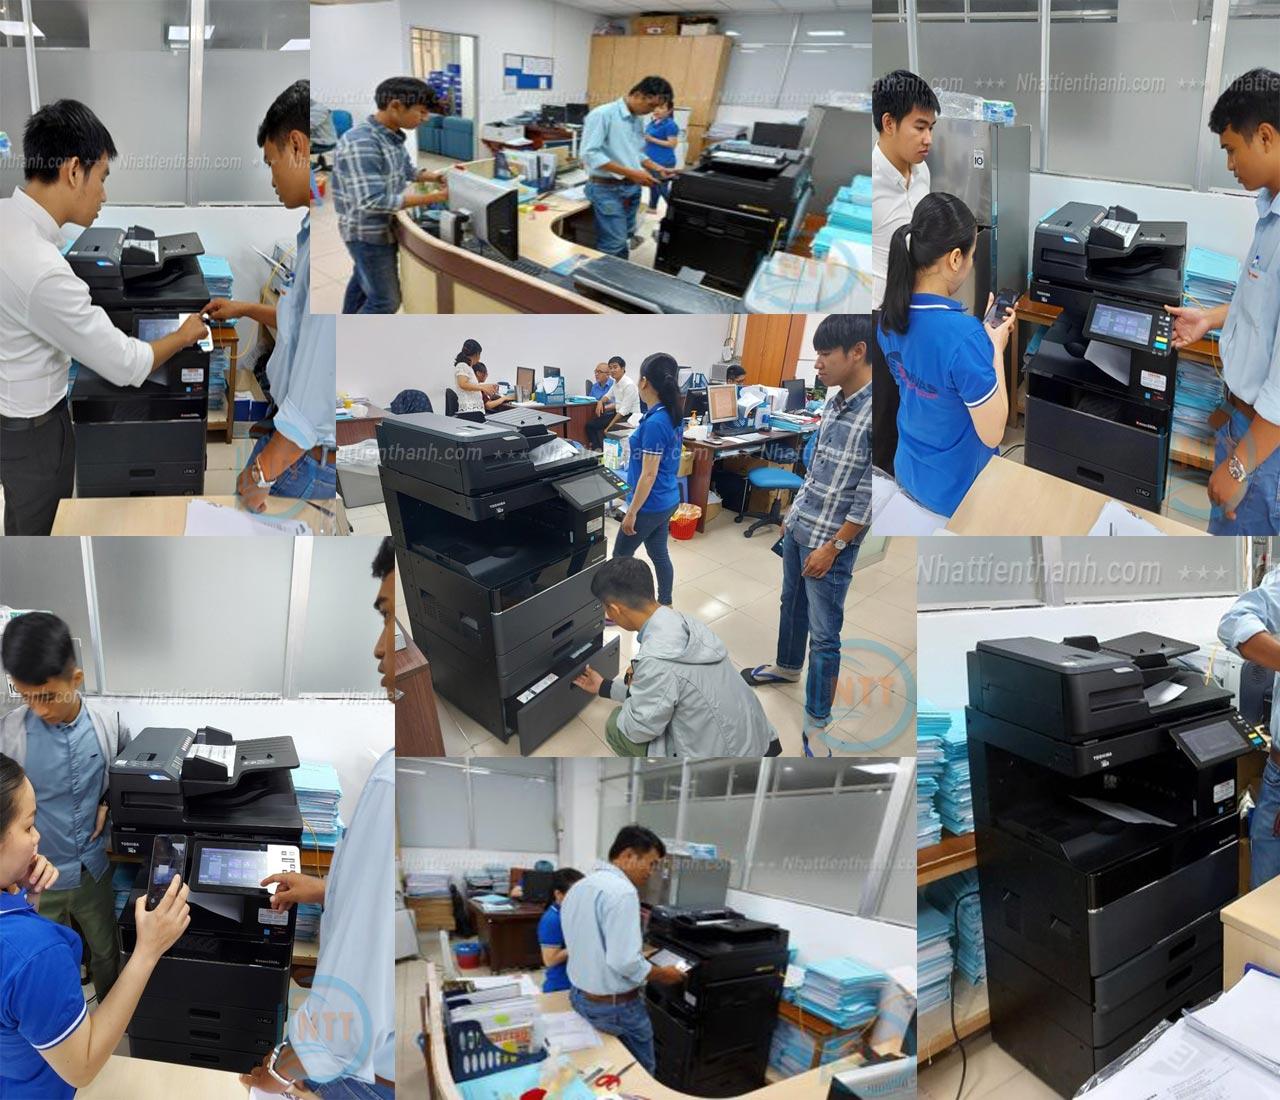 may-photocopy-toshiba-e-studio-4508a